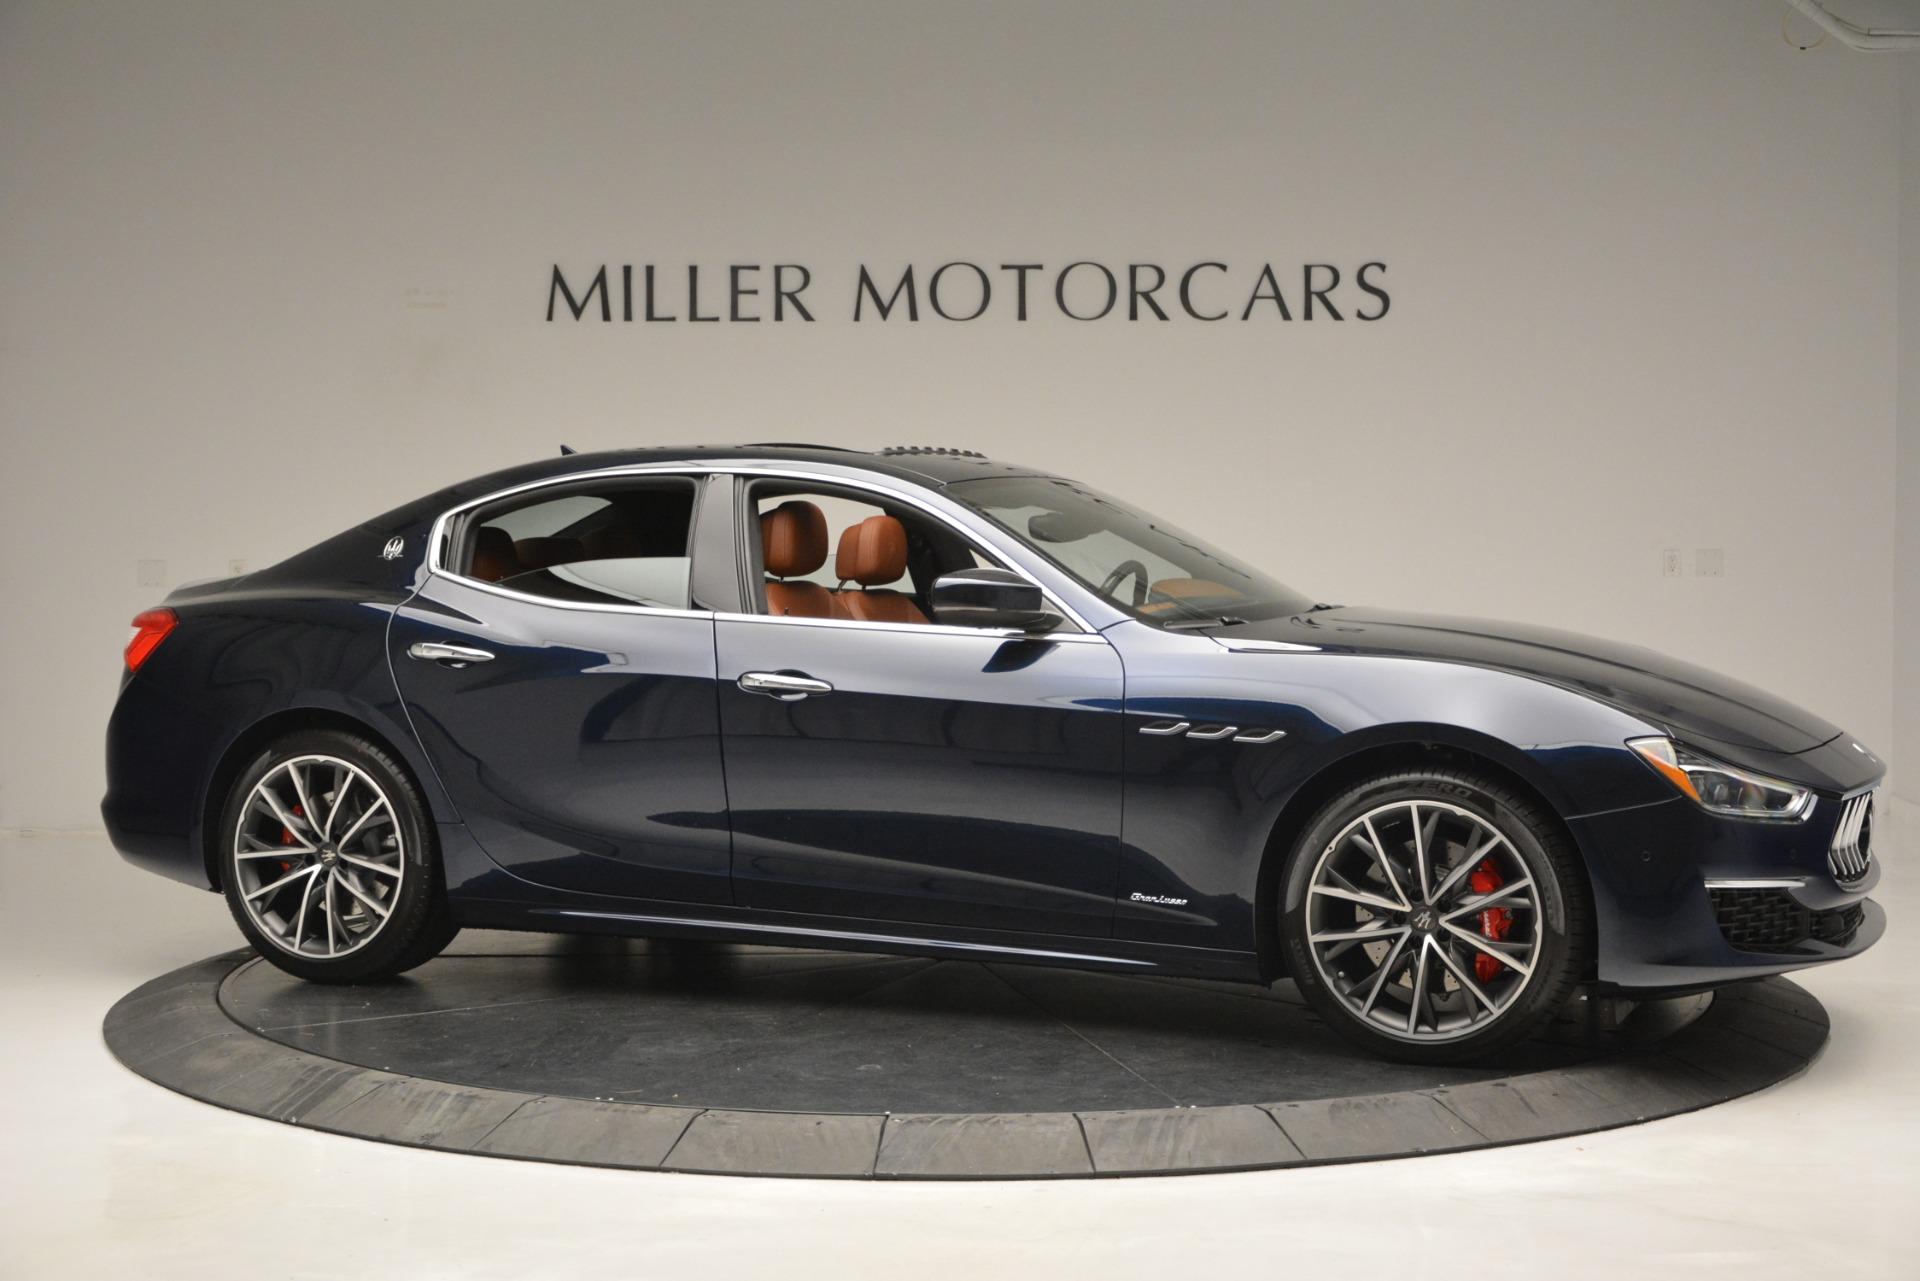 New 2019 Maserati Ghibli S Q4 GranSport For Sale In Greenwich, CT 2948_p14